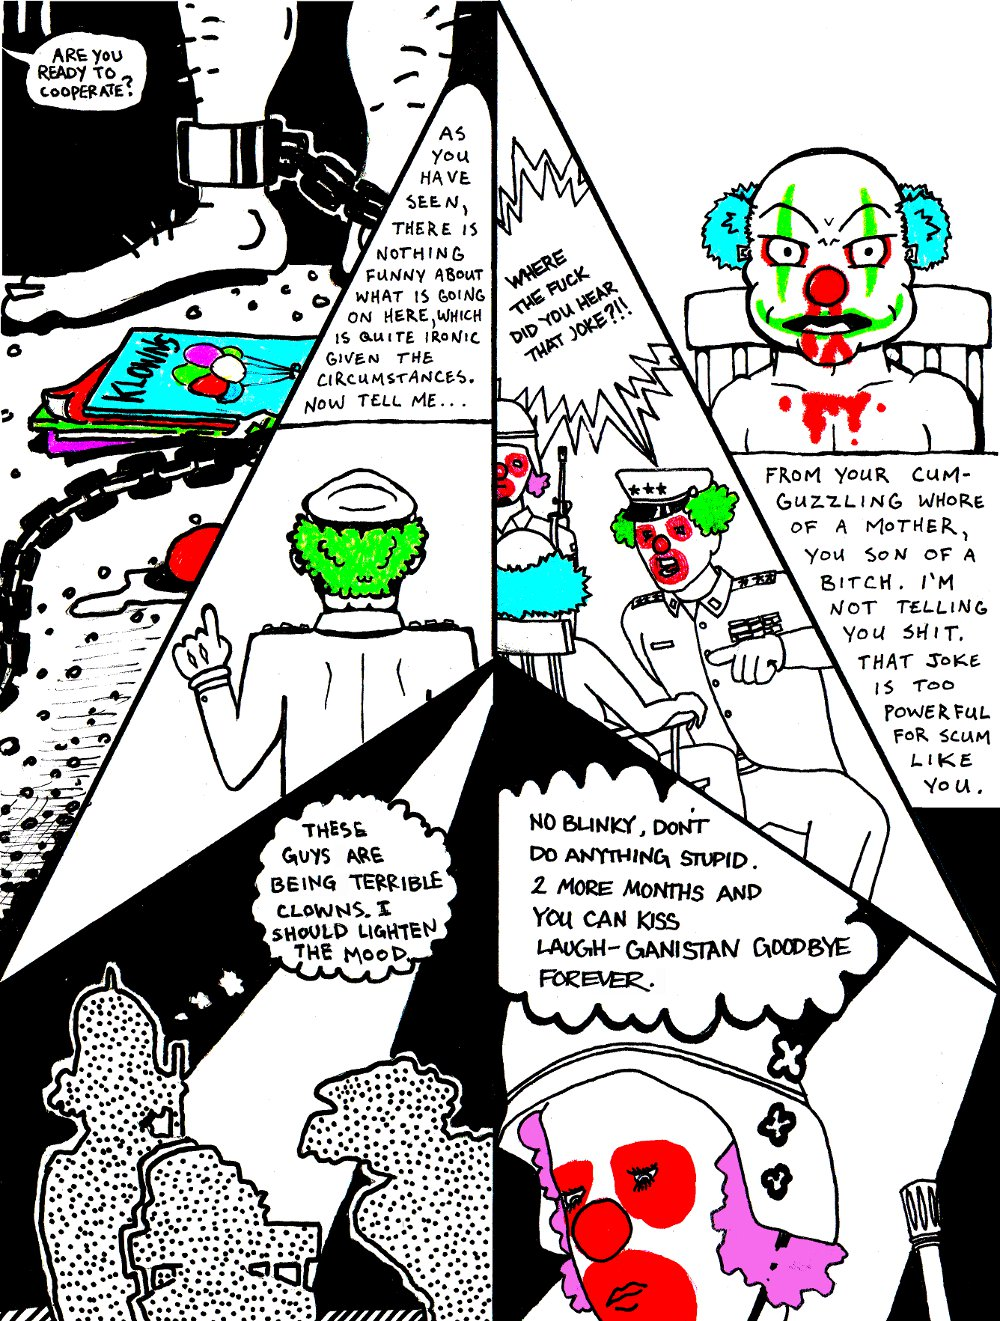 INTERROGATION (by Marx McNeill, Nate Crone, and Ed Rivera)